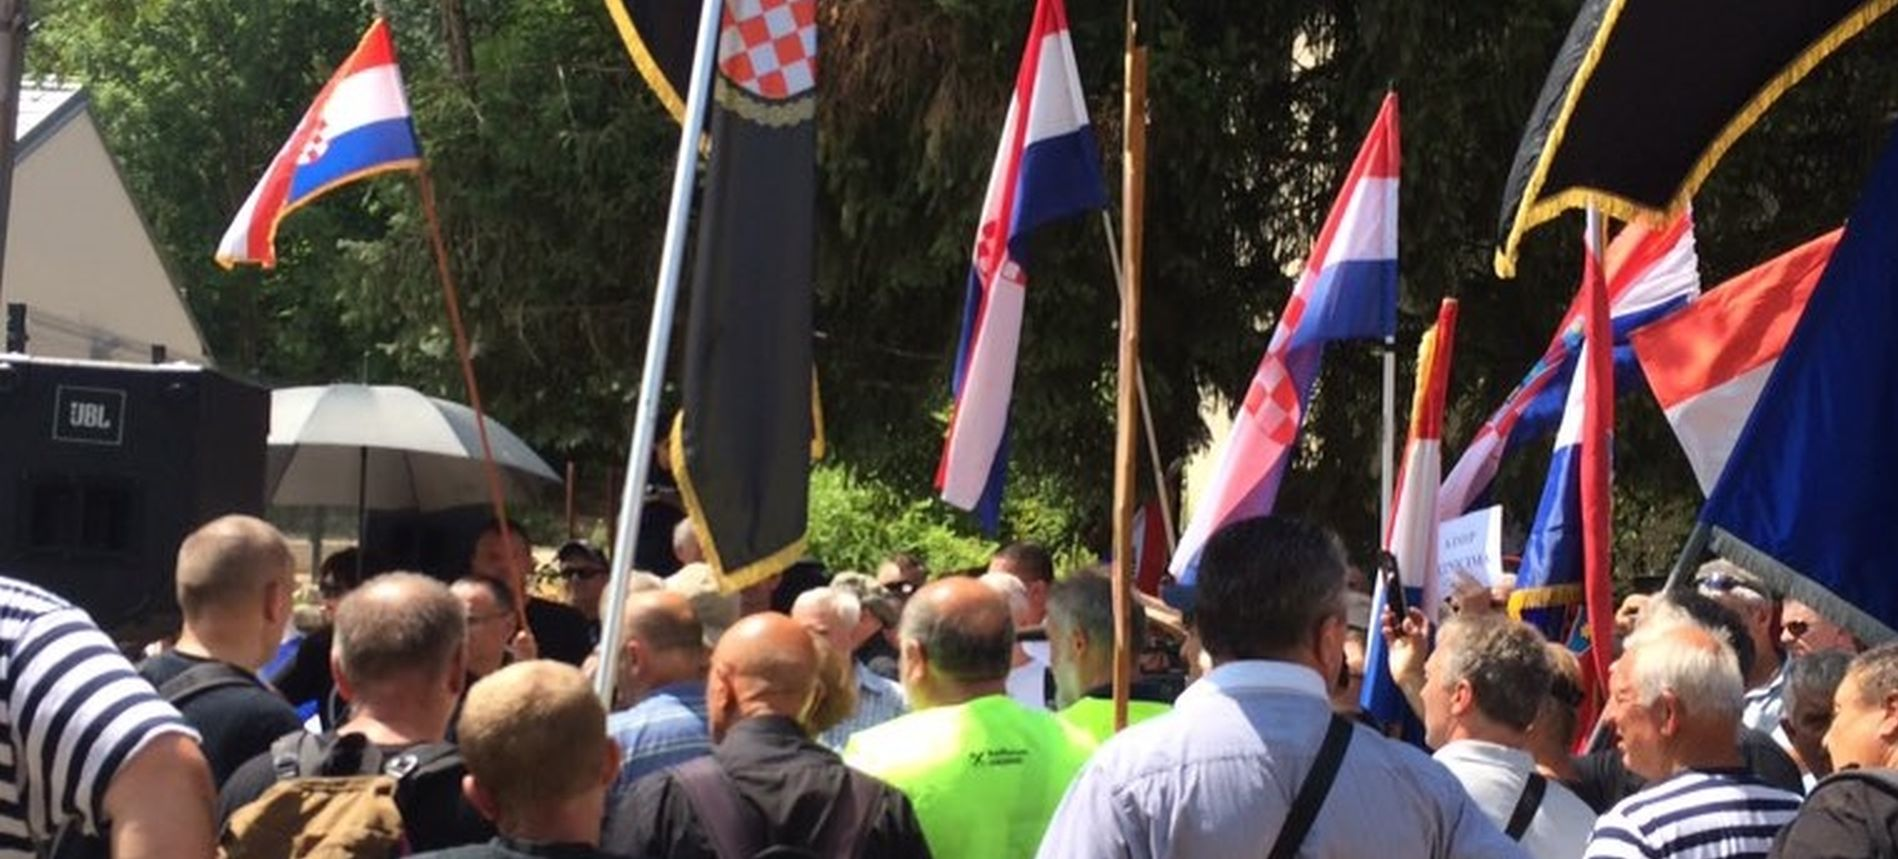 PROSLAVA U SRBU Zoran Pusić: HDZ aktivno pomaže NDH nostalgičare